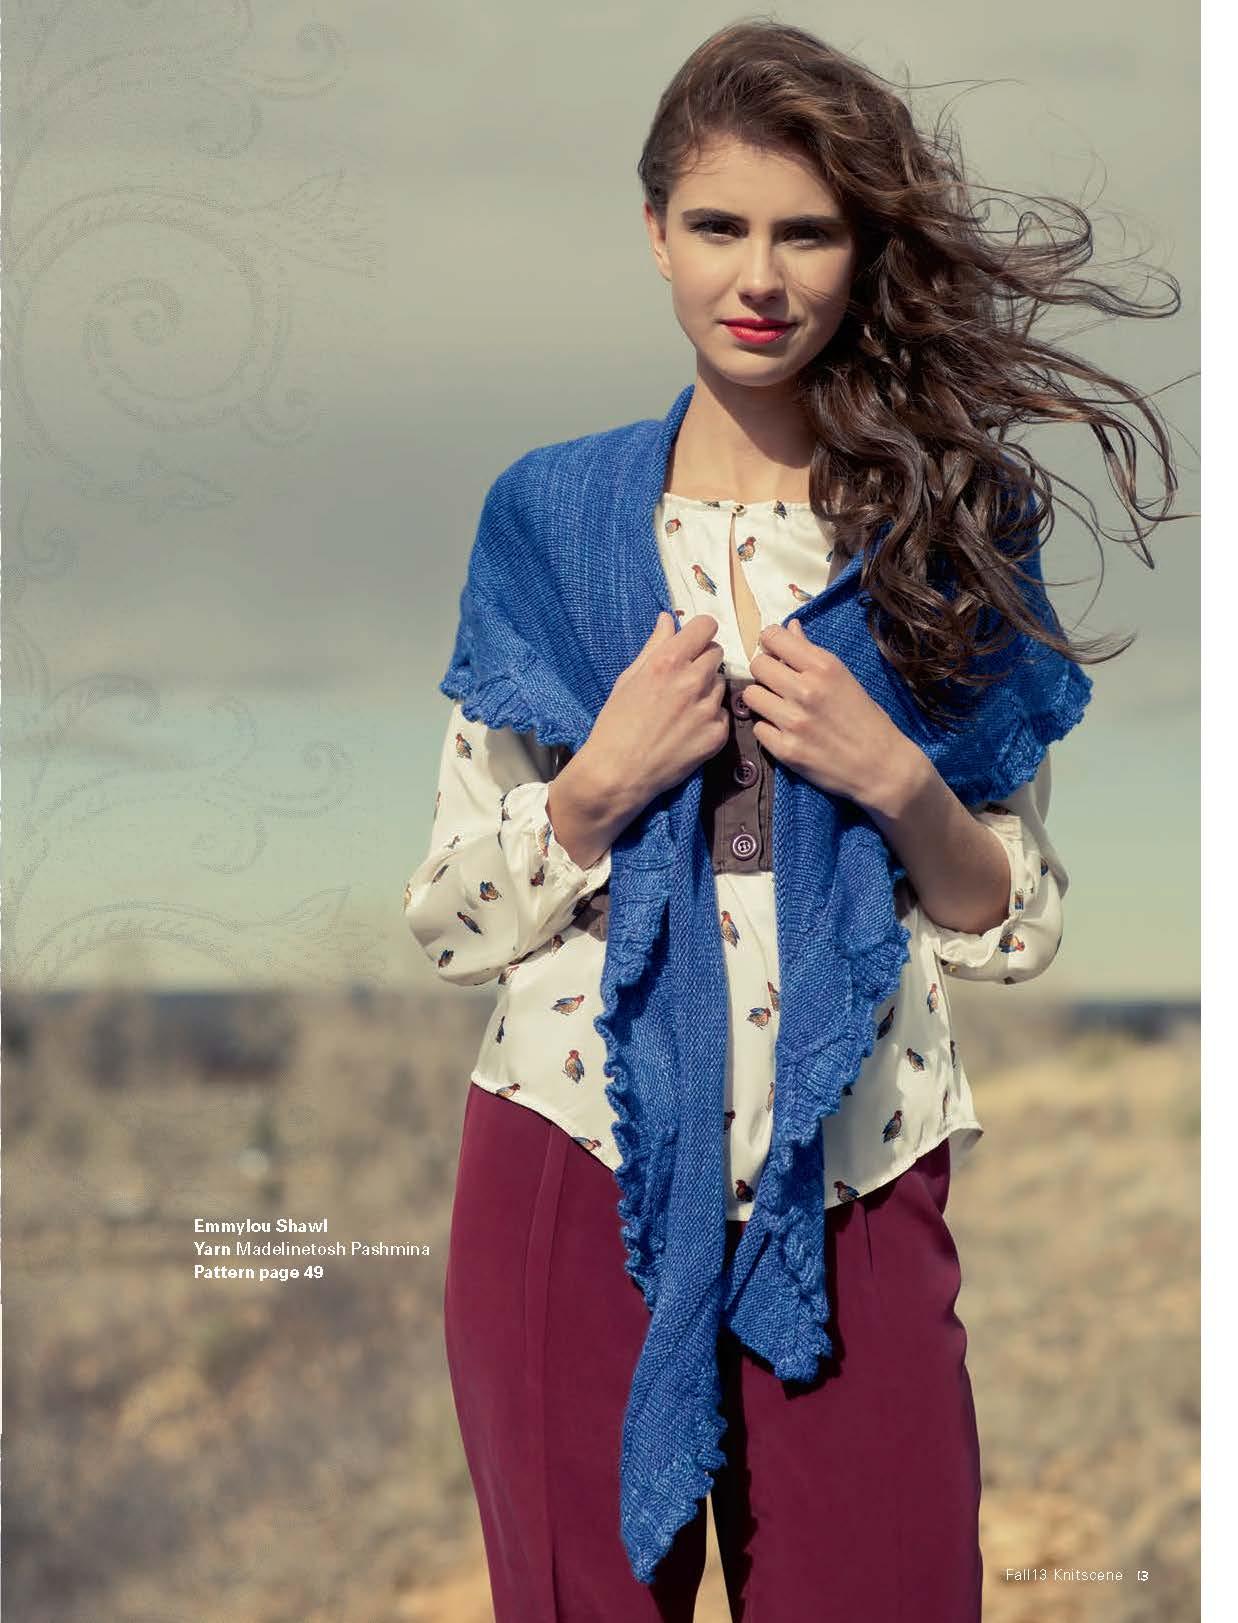 (2013) 07July01 knitscene magazine_Page_015.jpg